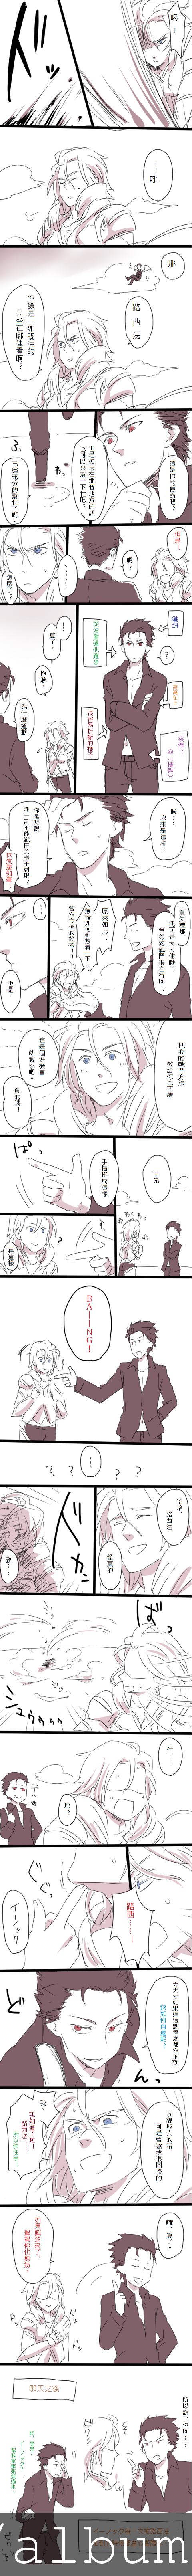 翻譯漫畫.png